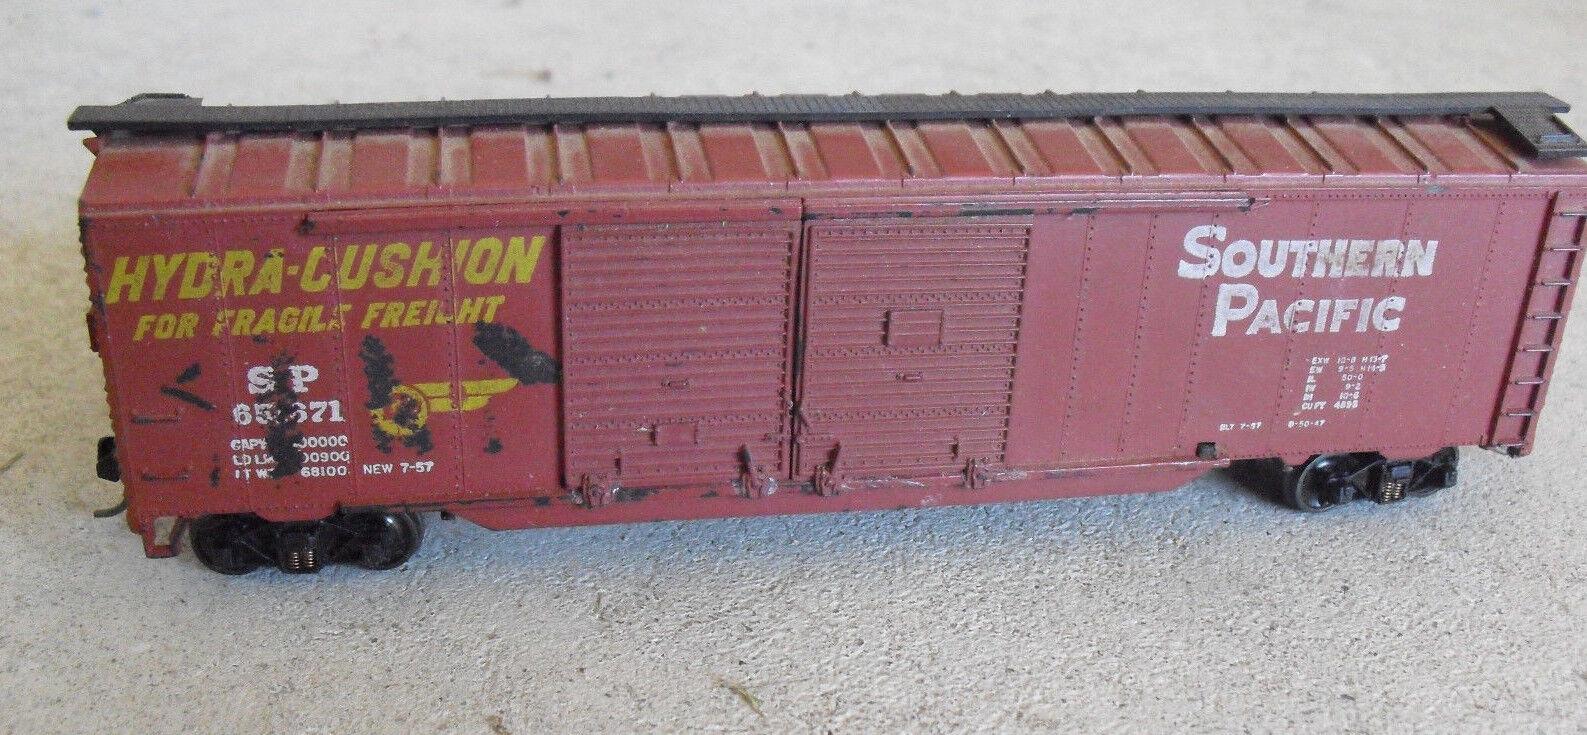 Industrial Rail N scale Freight Cars SOUTHERN PACIFIC SP HYDRA-Cushion box car